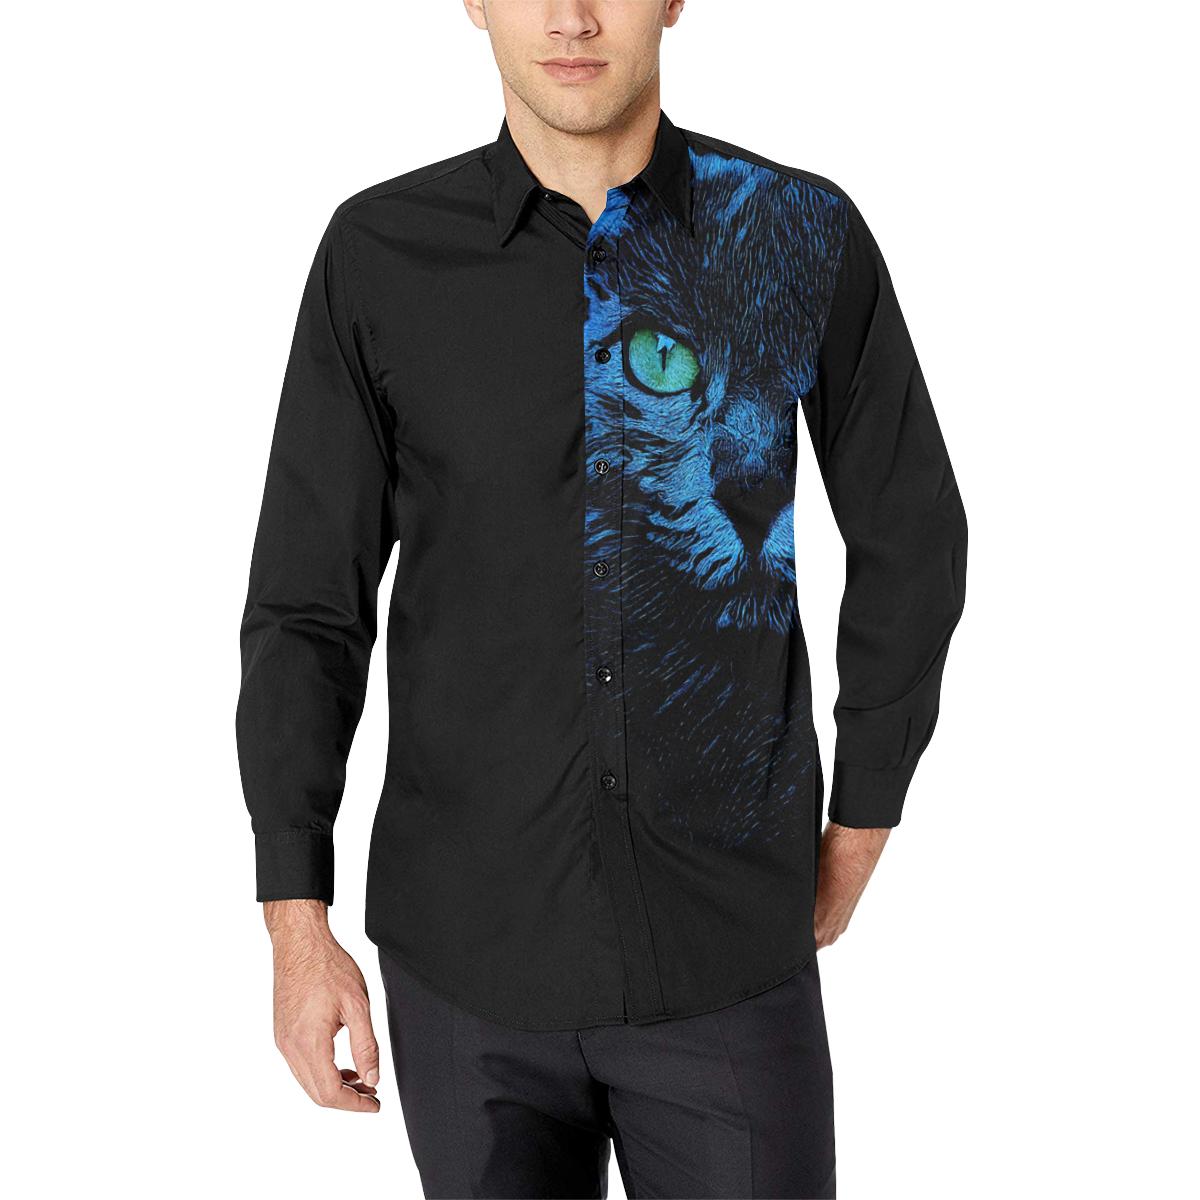 BLUE KORAT CAT GRACE Men's All Over Print Casual Dress Shirt (Model T61)